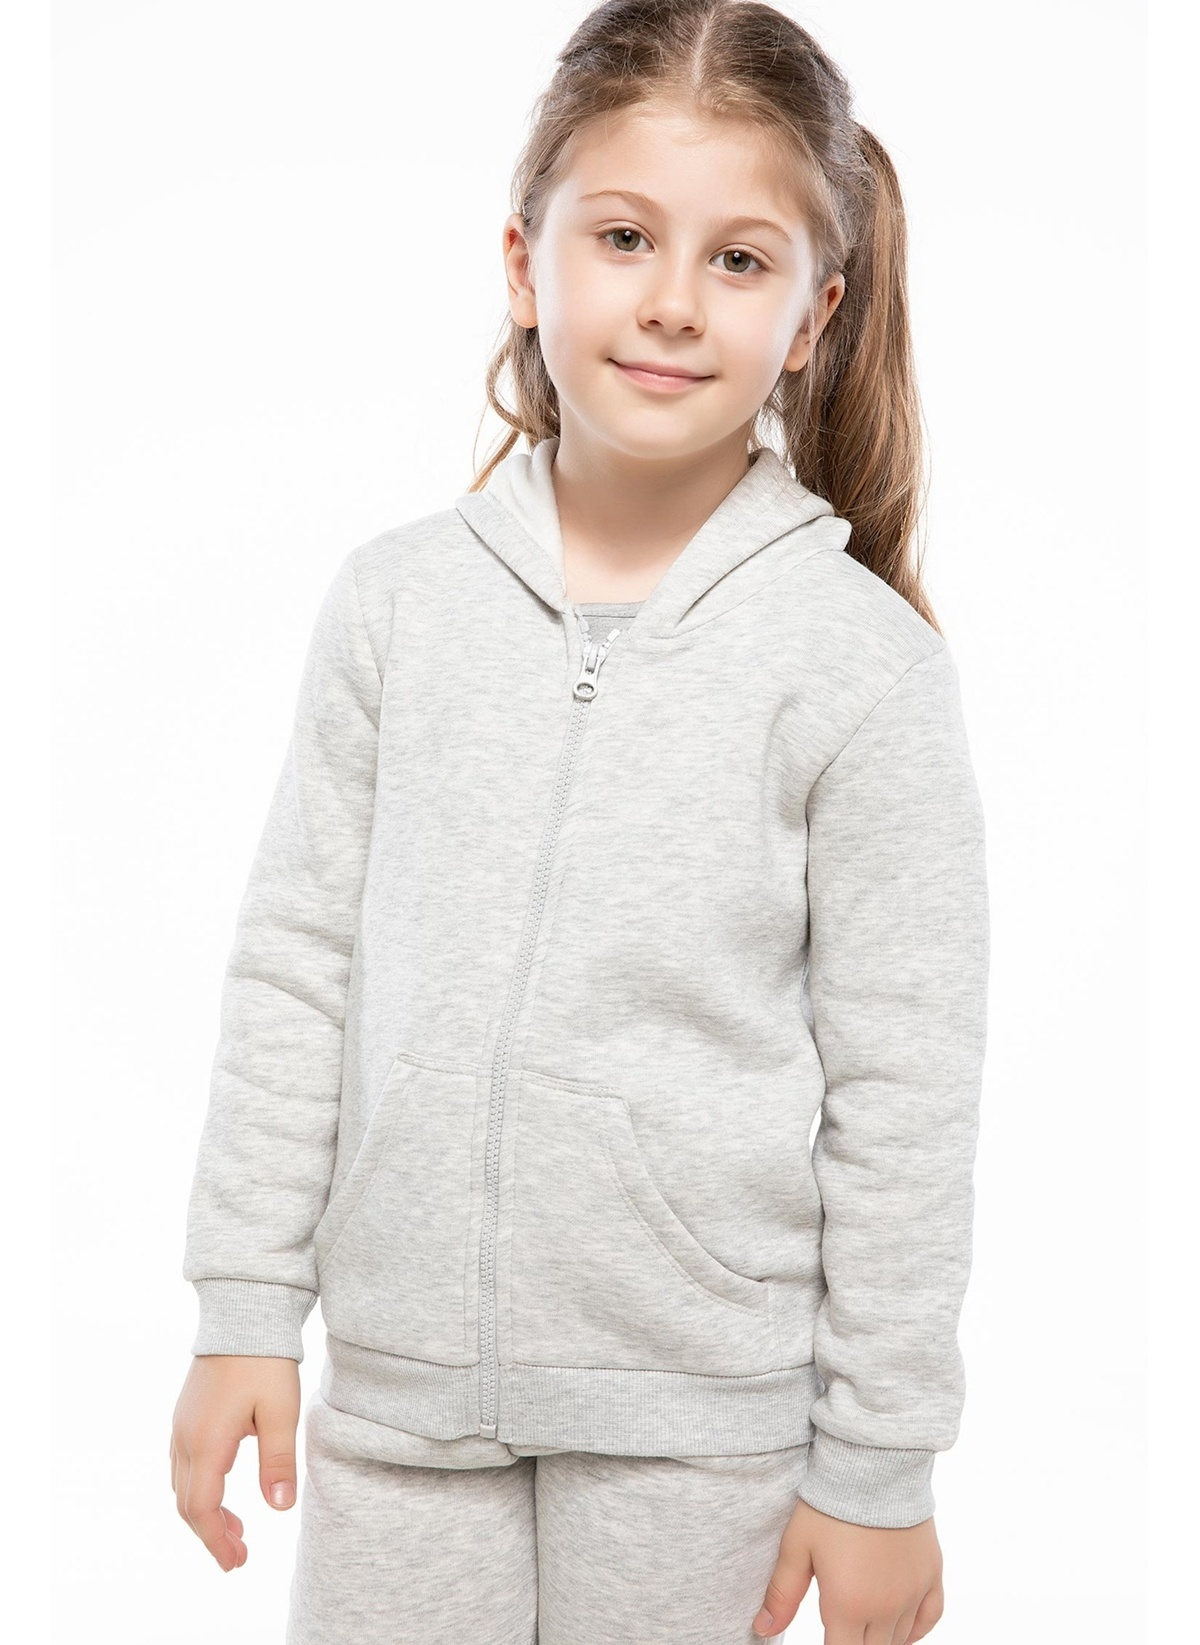 Defacto Kapşonlu Sweatshirt J0212a618augr158 Kapşonlu Sweatshirt – 29.99 TL